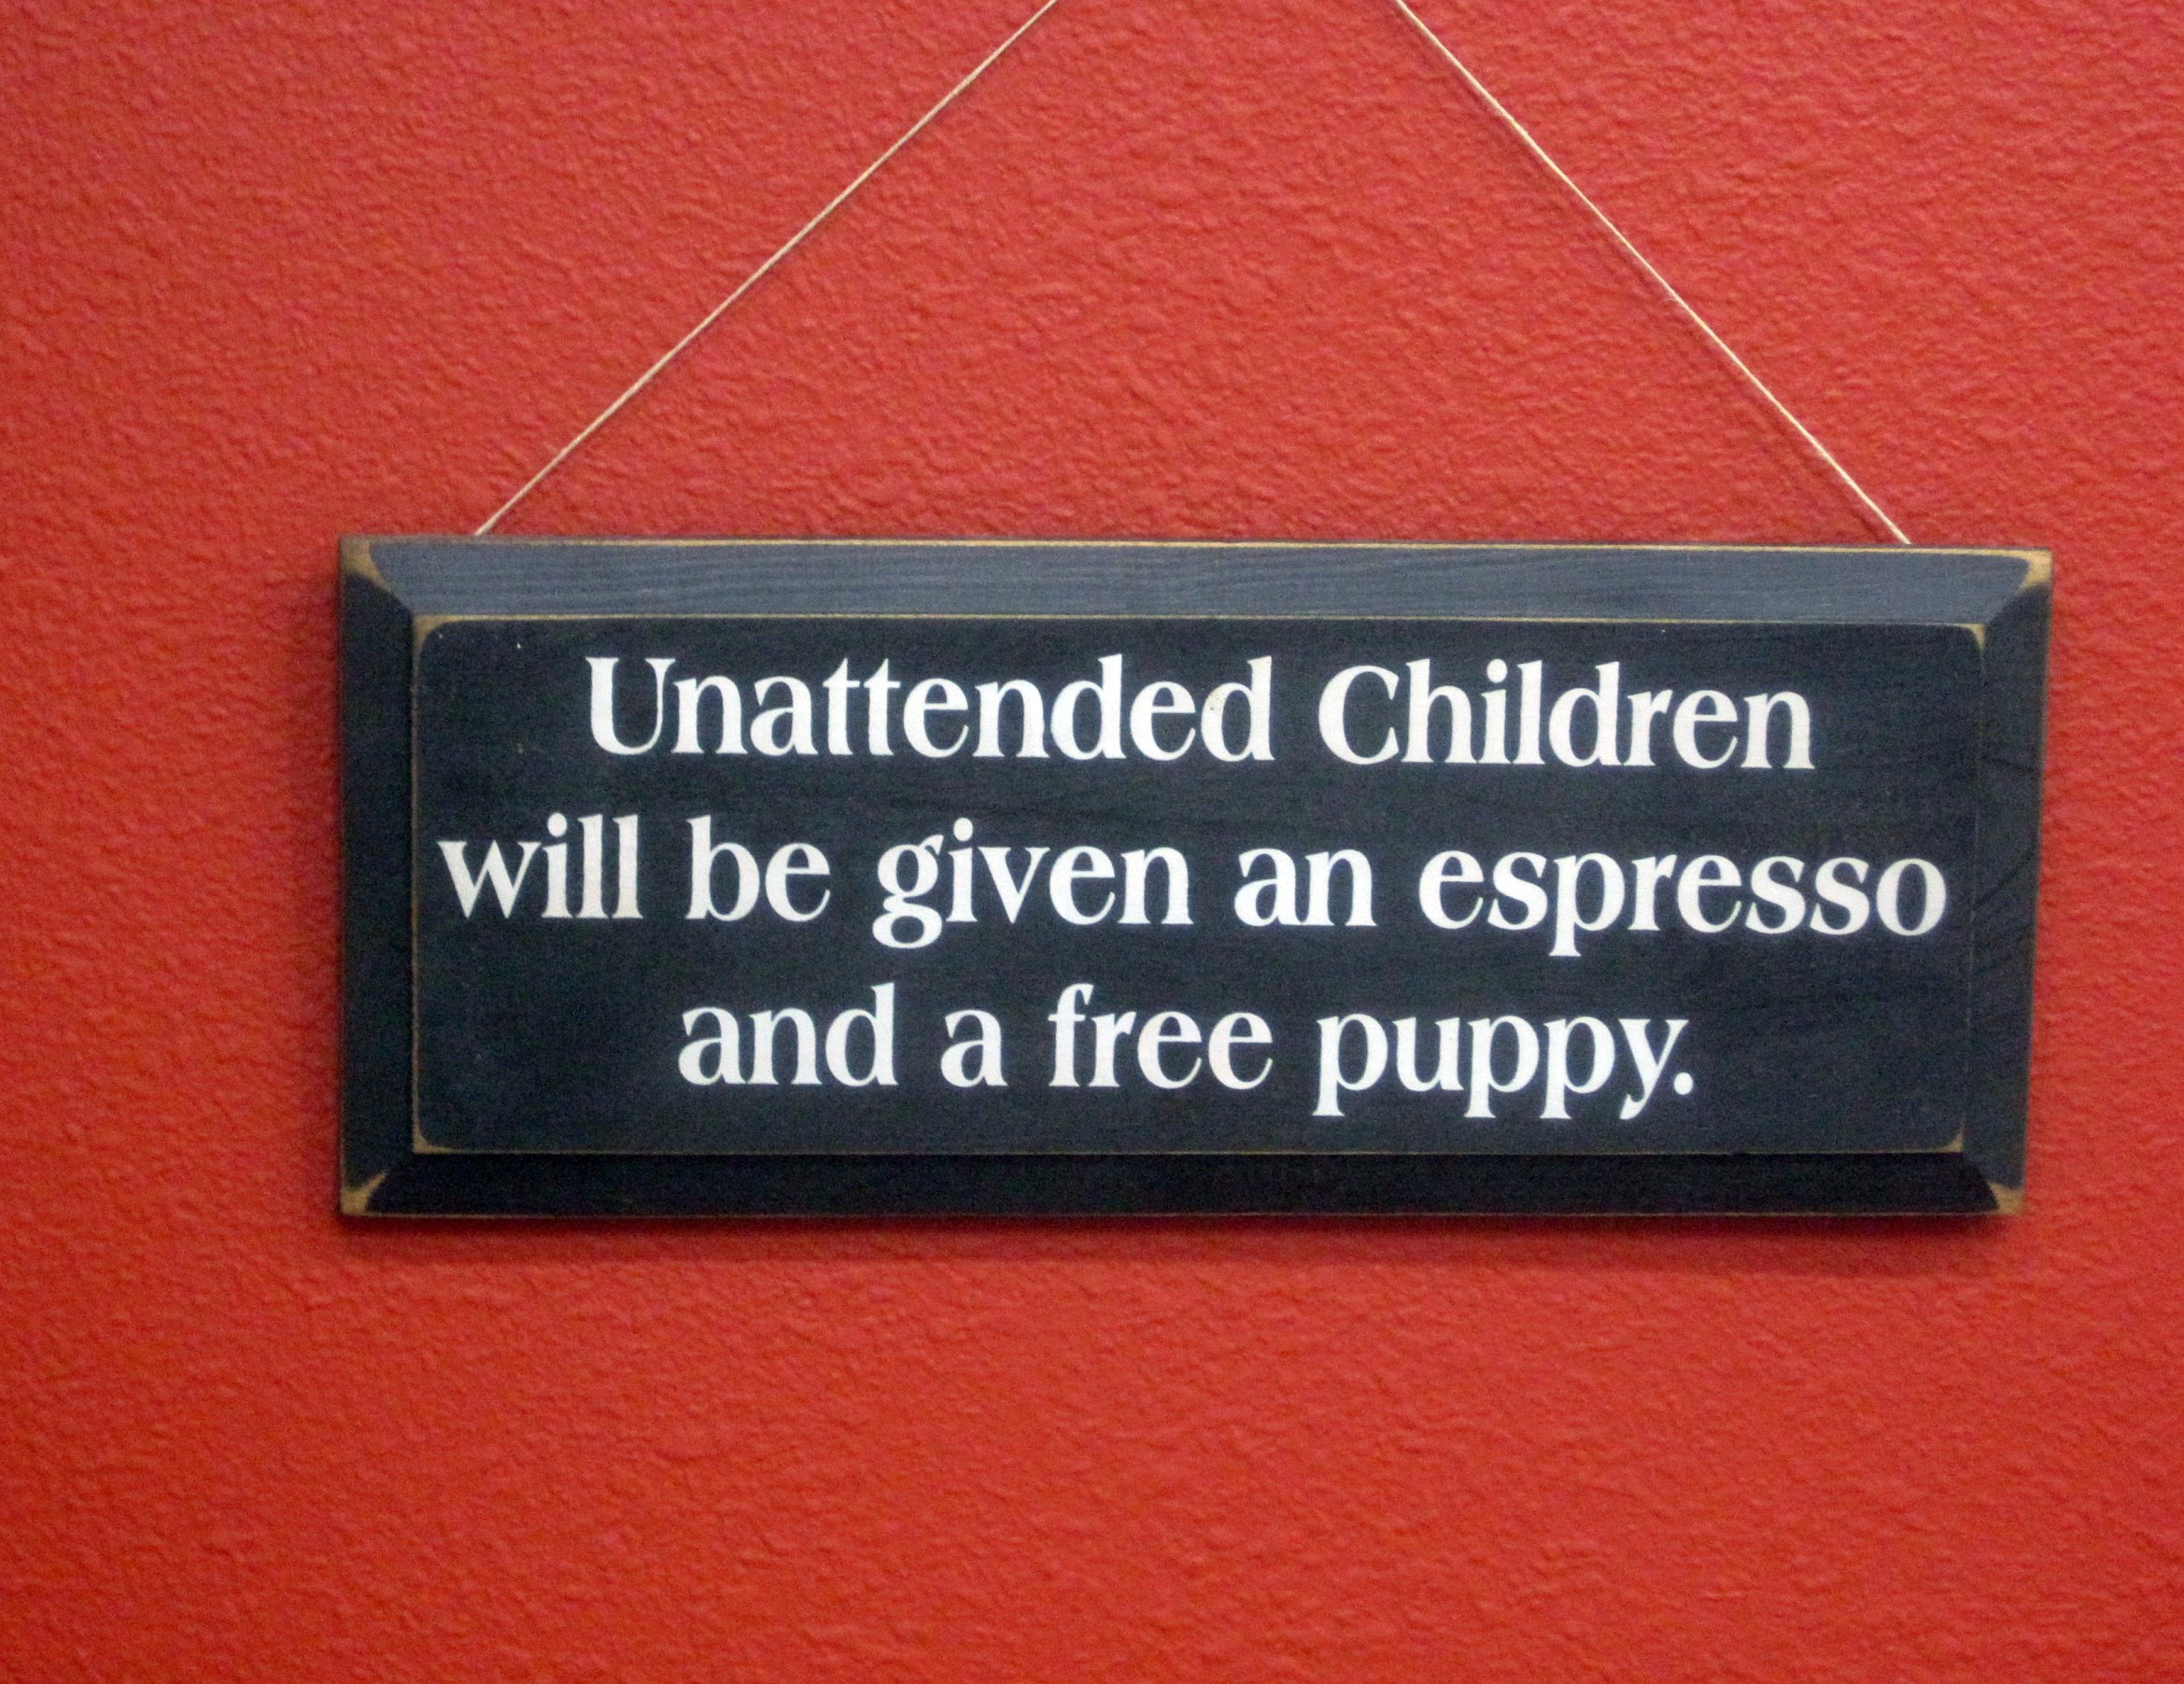 """Unattended Children"" by  Michael Allen Smith  licensed under  CC BY-SA 2.0"